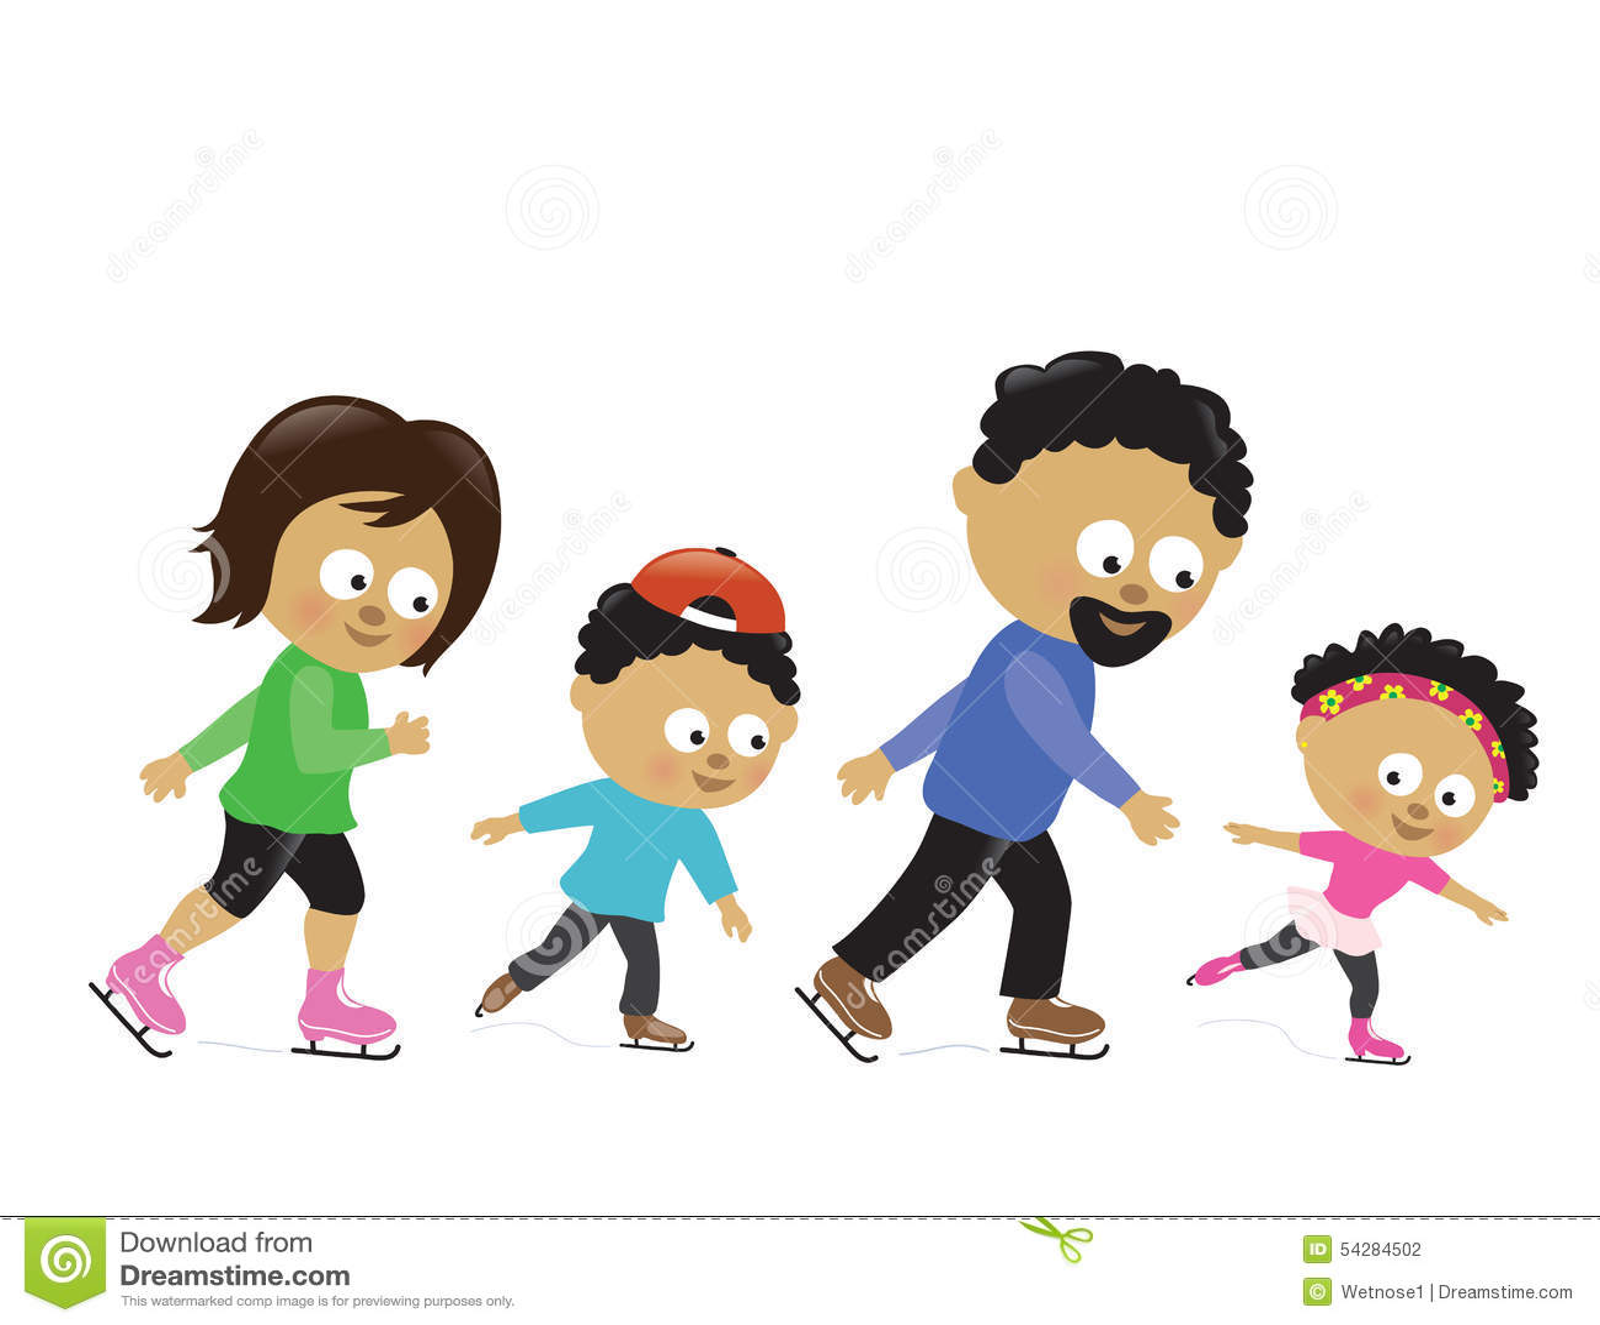 Family Ice Skating 2 Stock Illustration - Image: 54284502